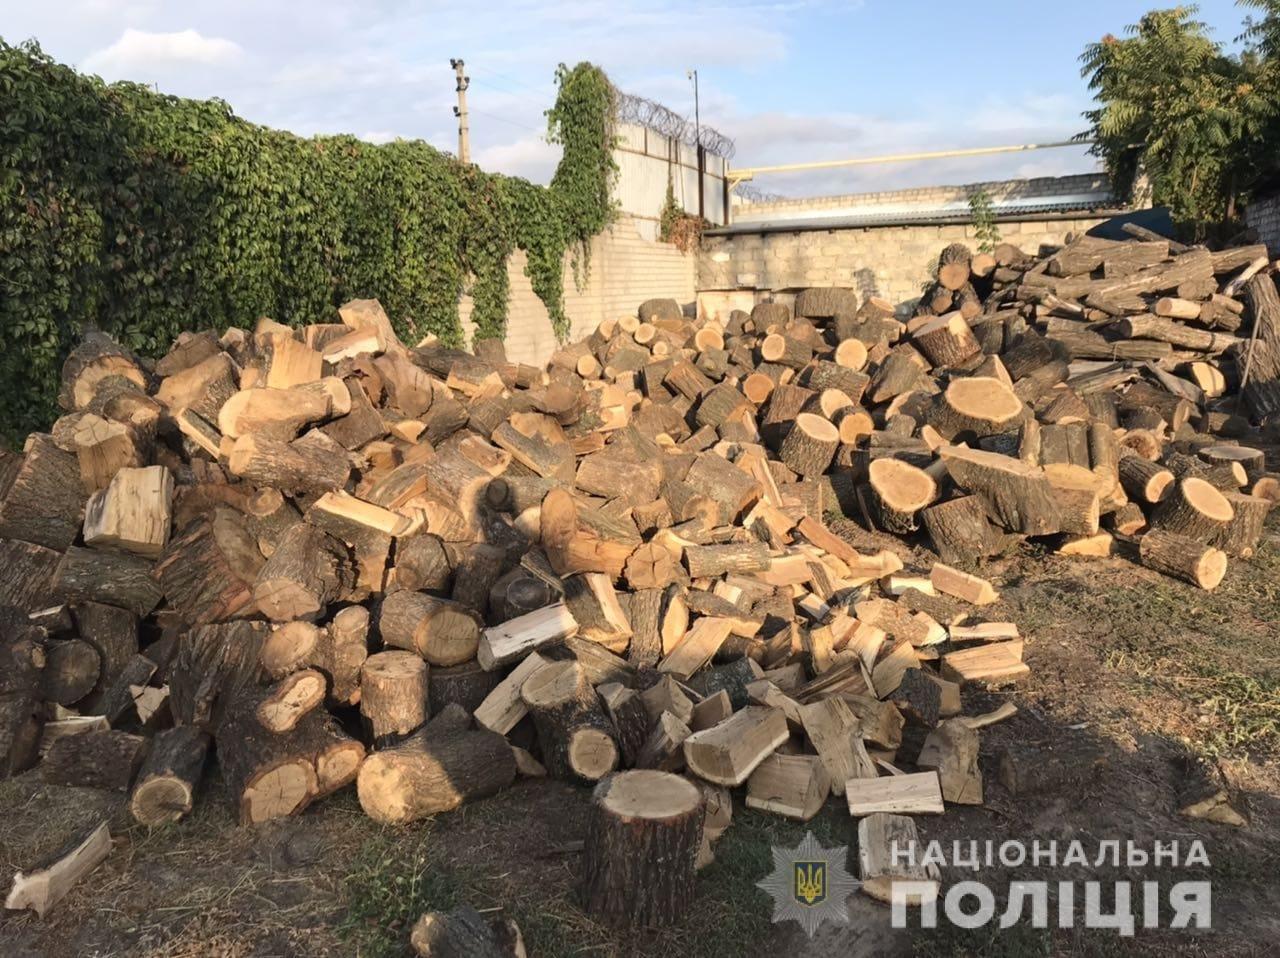 На Днепропетровщине полиция обнаружила очередного дроворуба, - ФОТО, фото-1